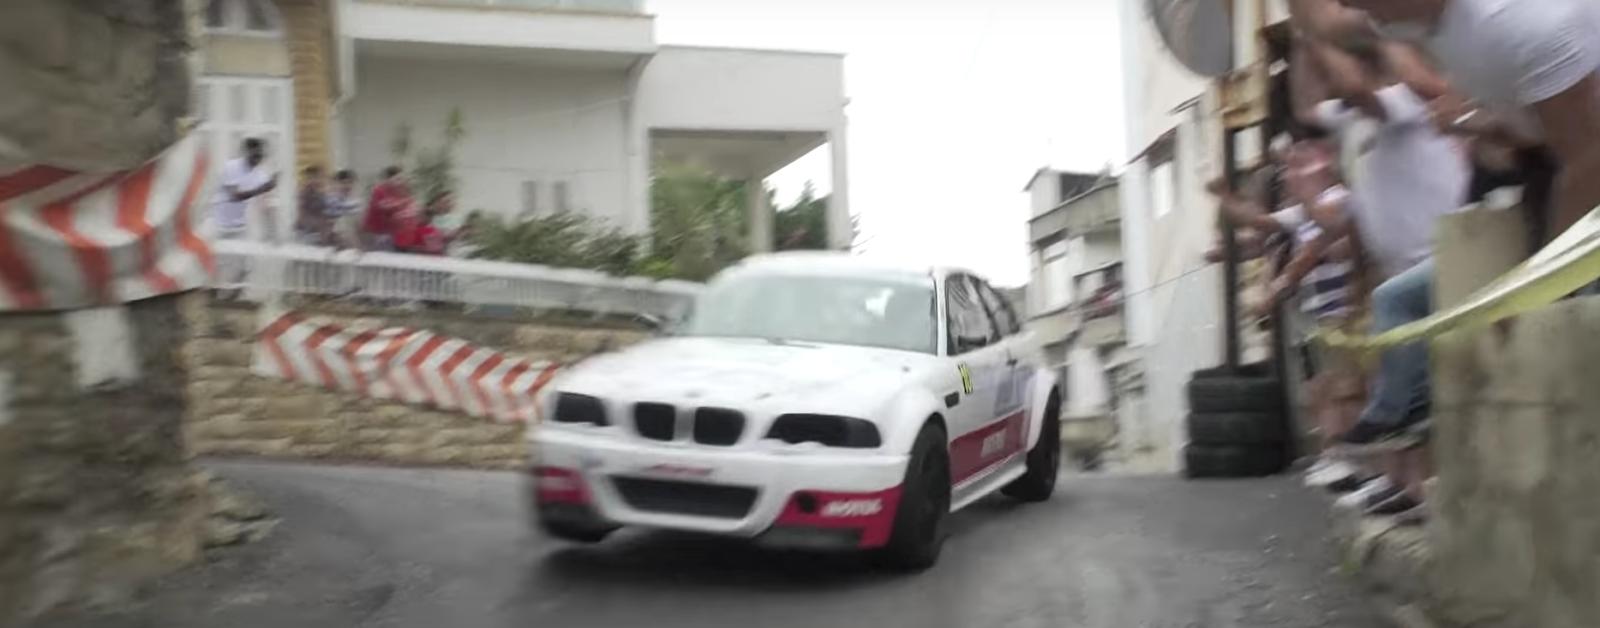 bmw2B330ci2Bhillclimb Δες μια απολαυστική ανάβαση με μια BMW E46 330 CI BMW, BMW 330 CI, Hillclimb, videos